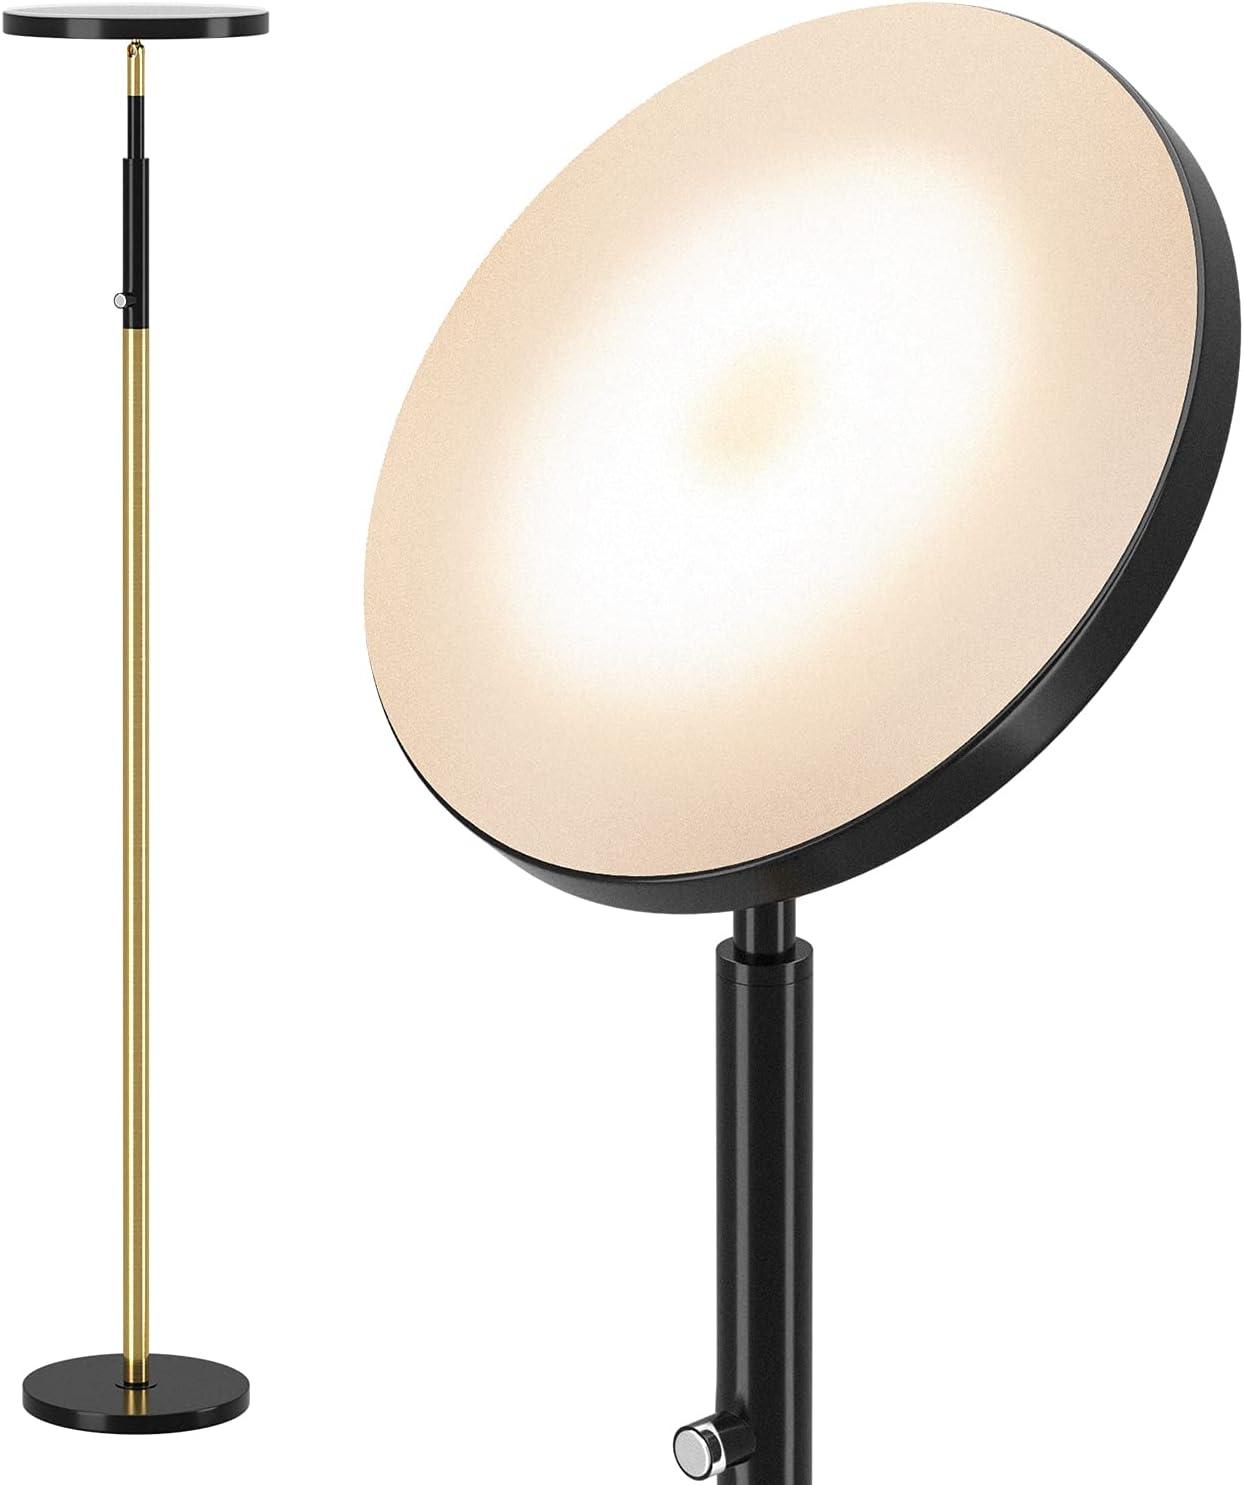 DEEPLITE LED Torchiere Floor Factory outlet Lamp - Soft Surprise price LEDs 2700K Light 34W